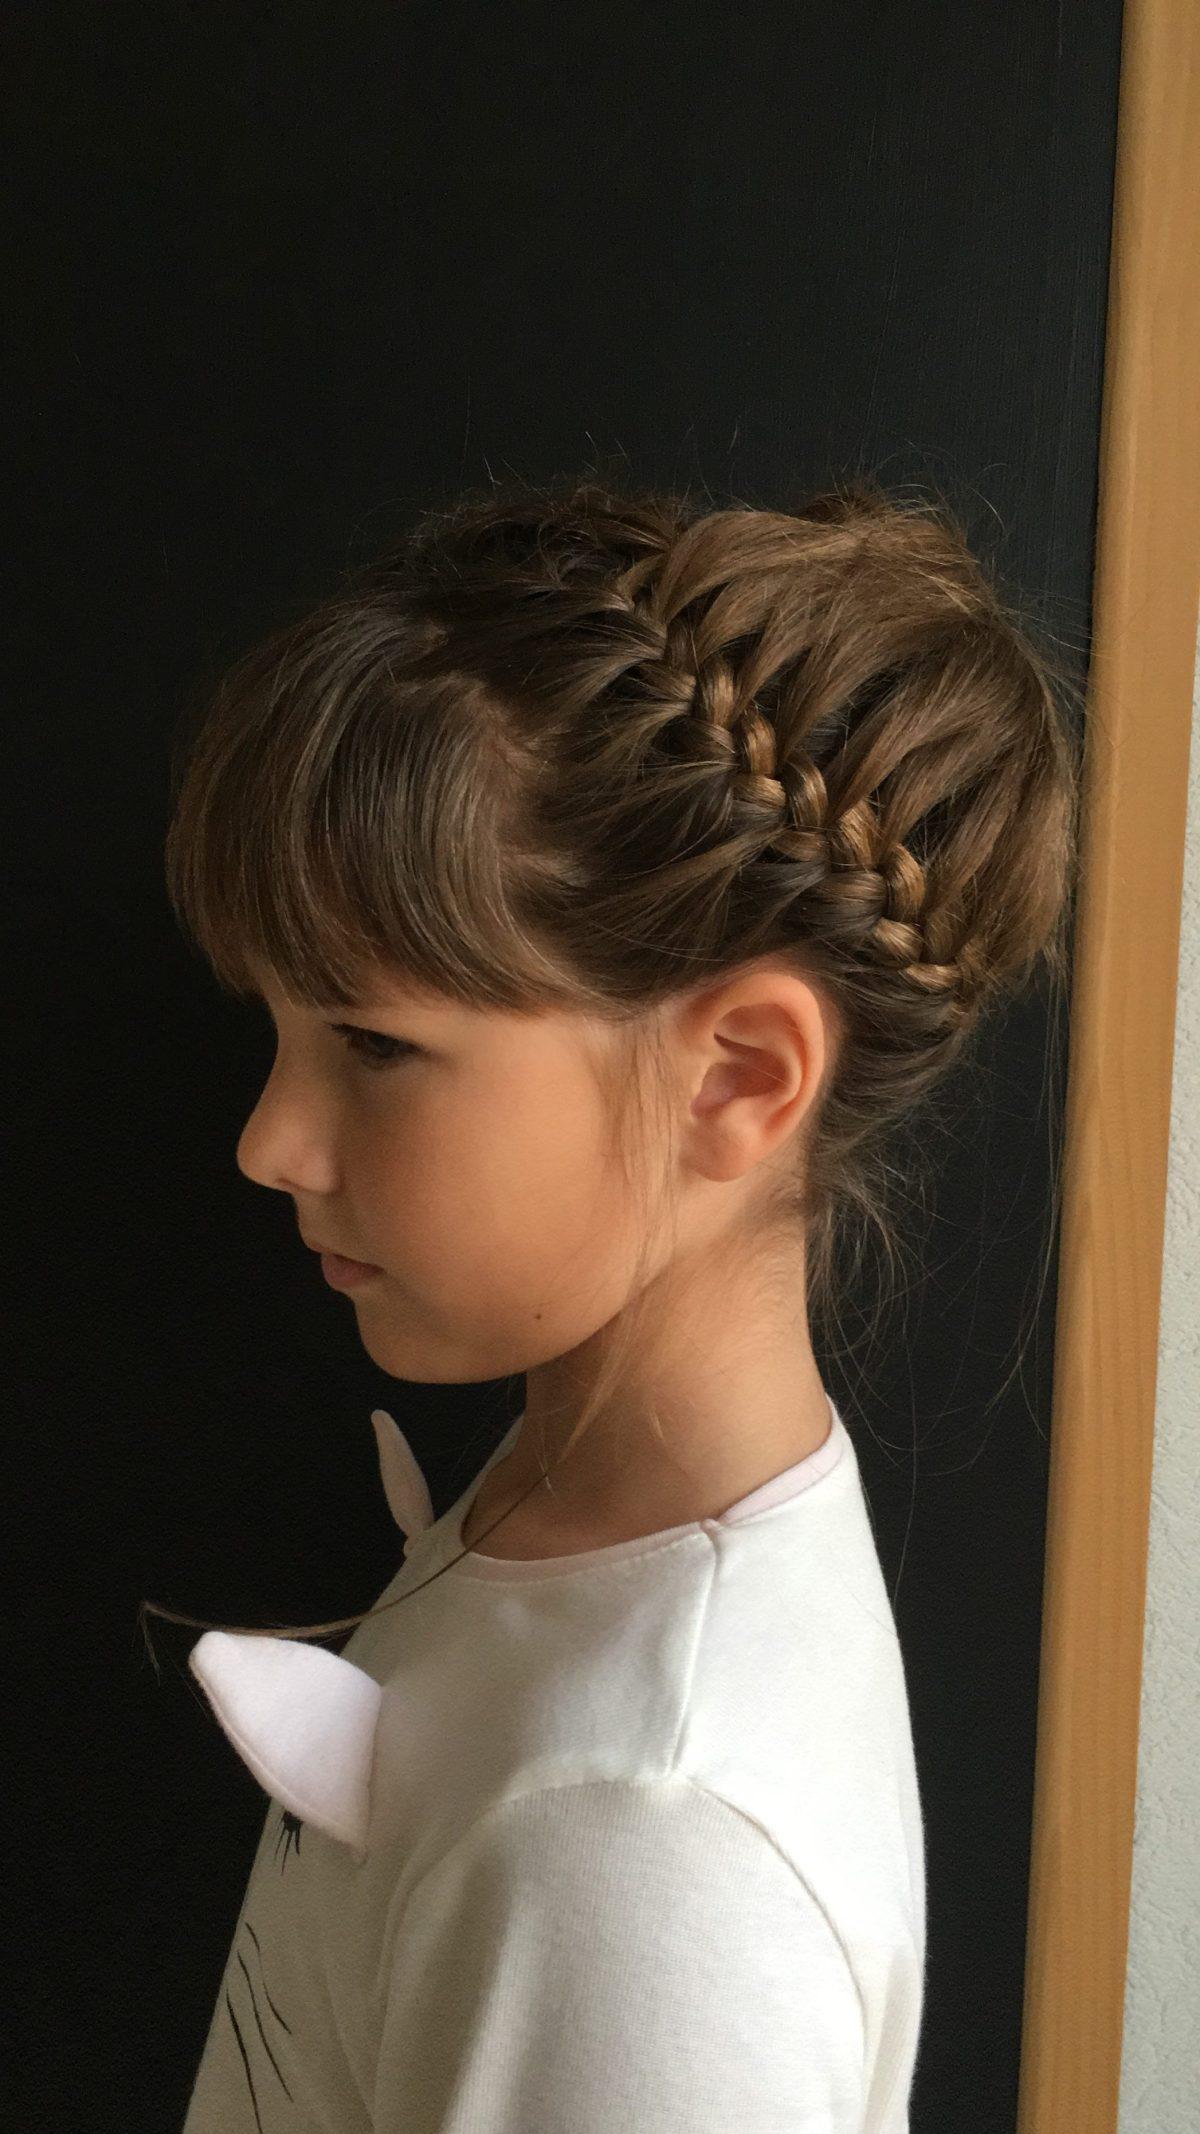 atelier coiffure bricolage activite parent enfant blog suisse thereseandthekids